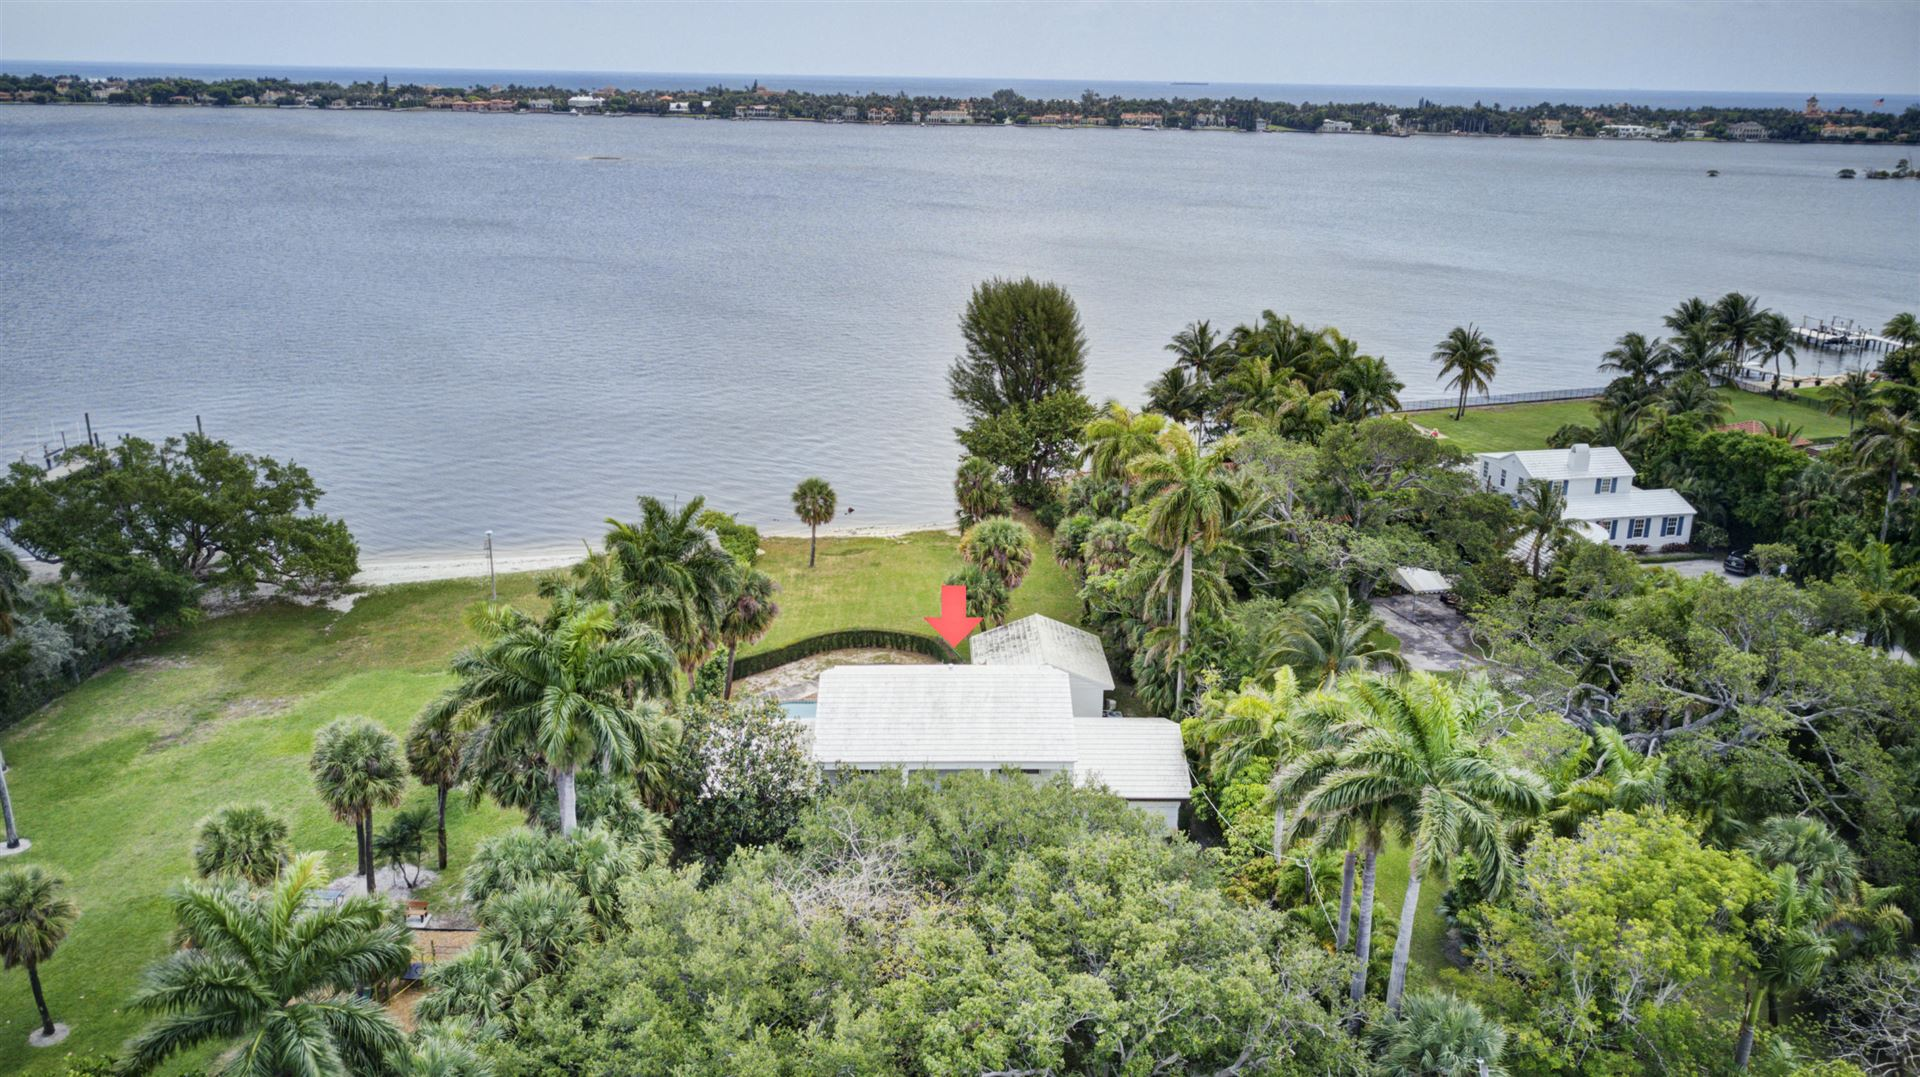 Photo of 3110 Washington Road, West Palm Beach, FL 33405 (MLS # RX-10657665)